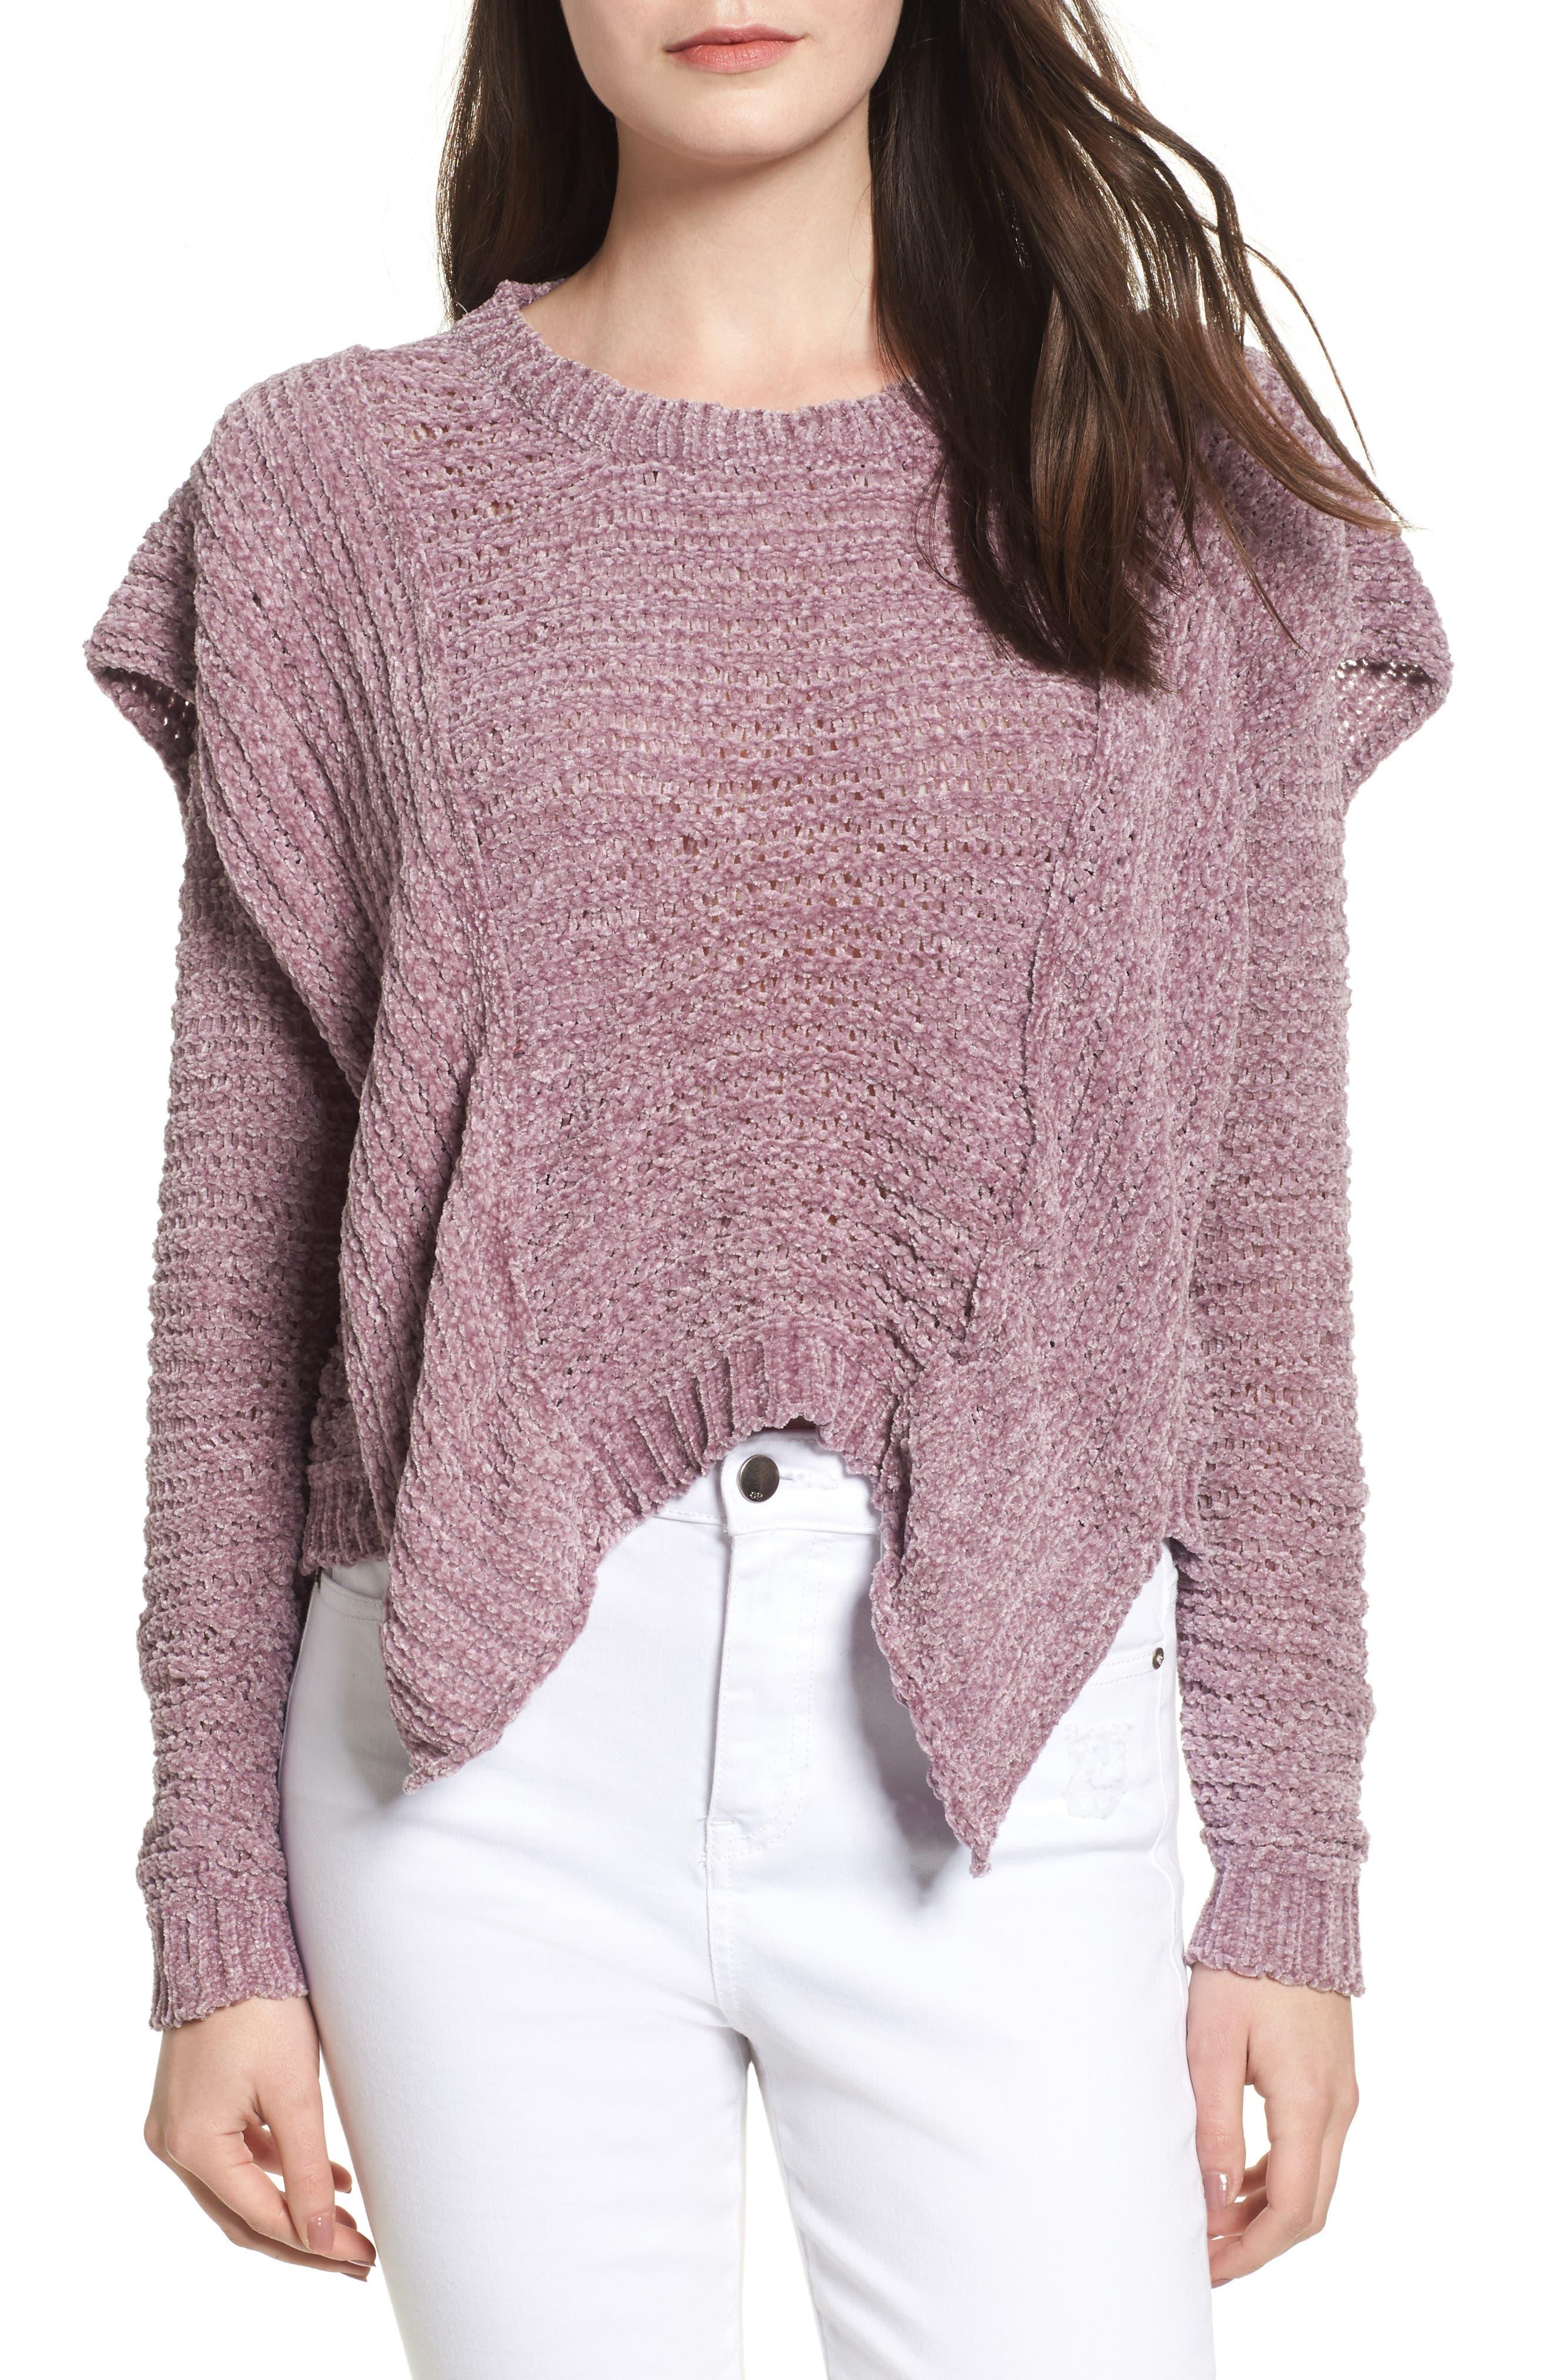 Main Image - Woven Heart Ruffle Chenille Sweater